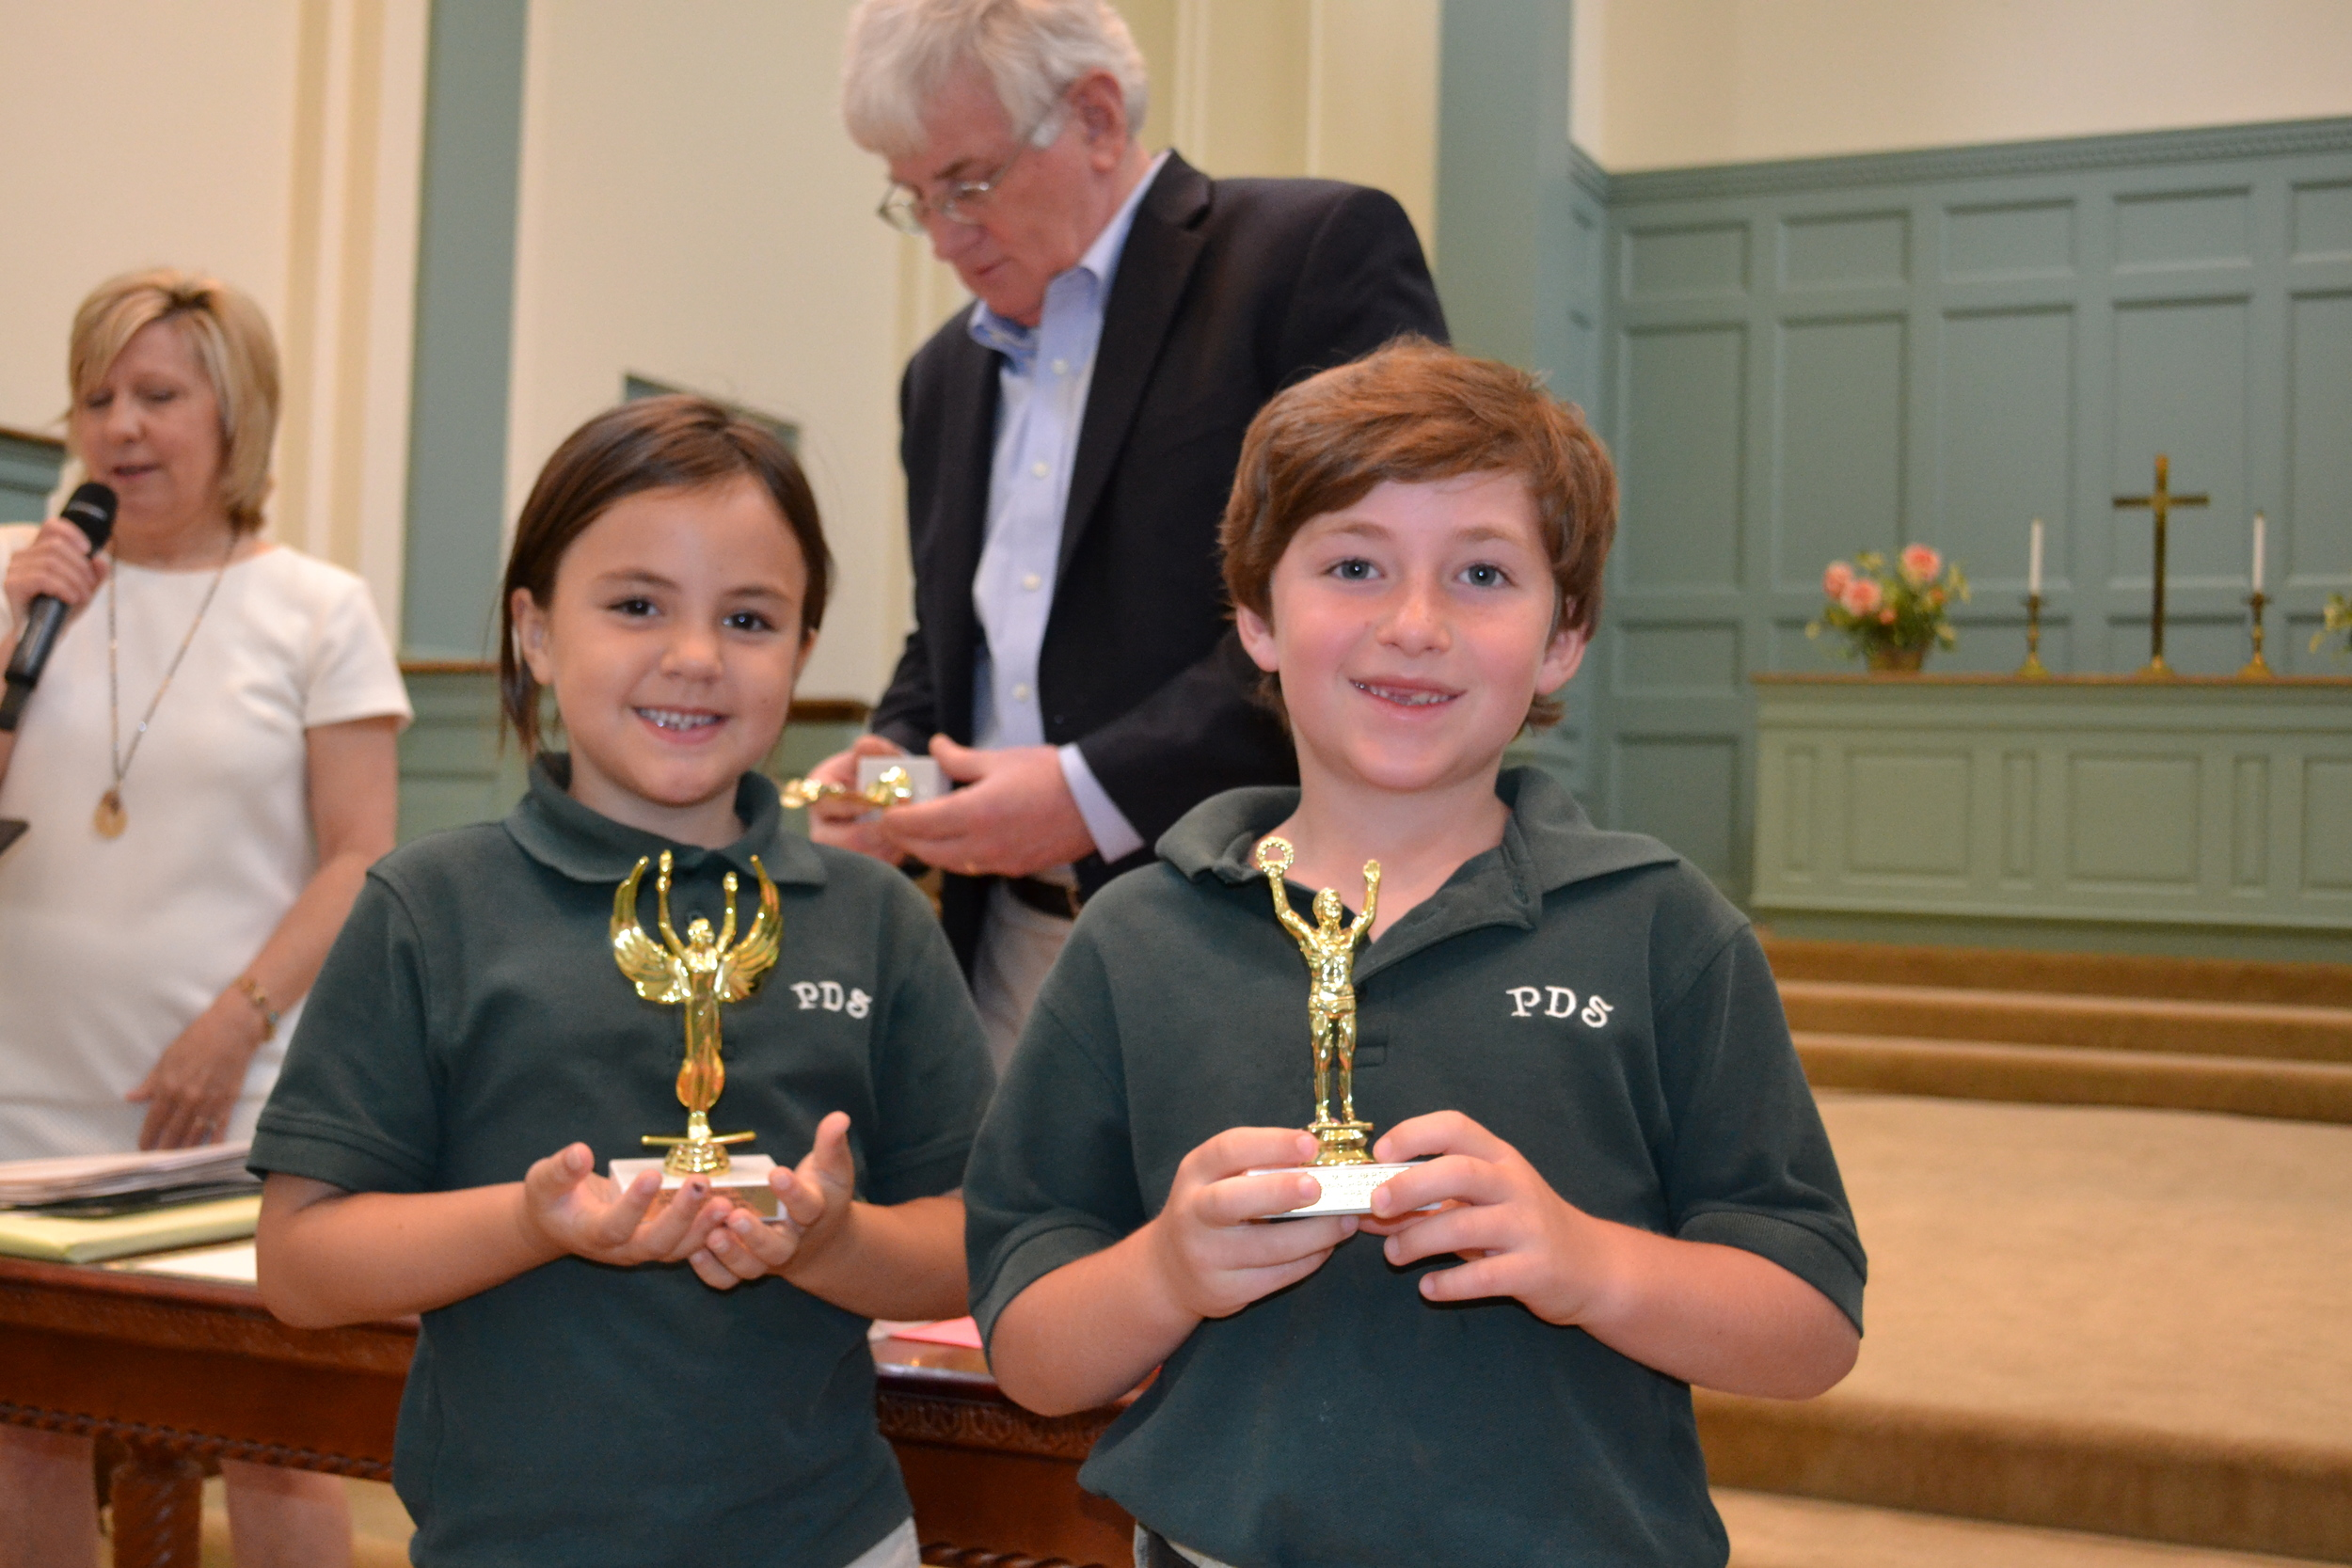 Claude E McRoberts, III Sportsmanship Award